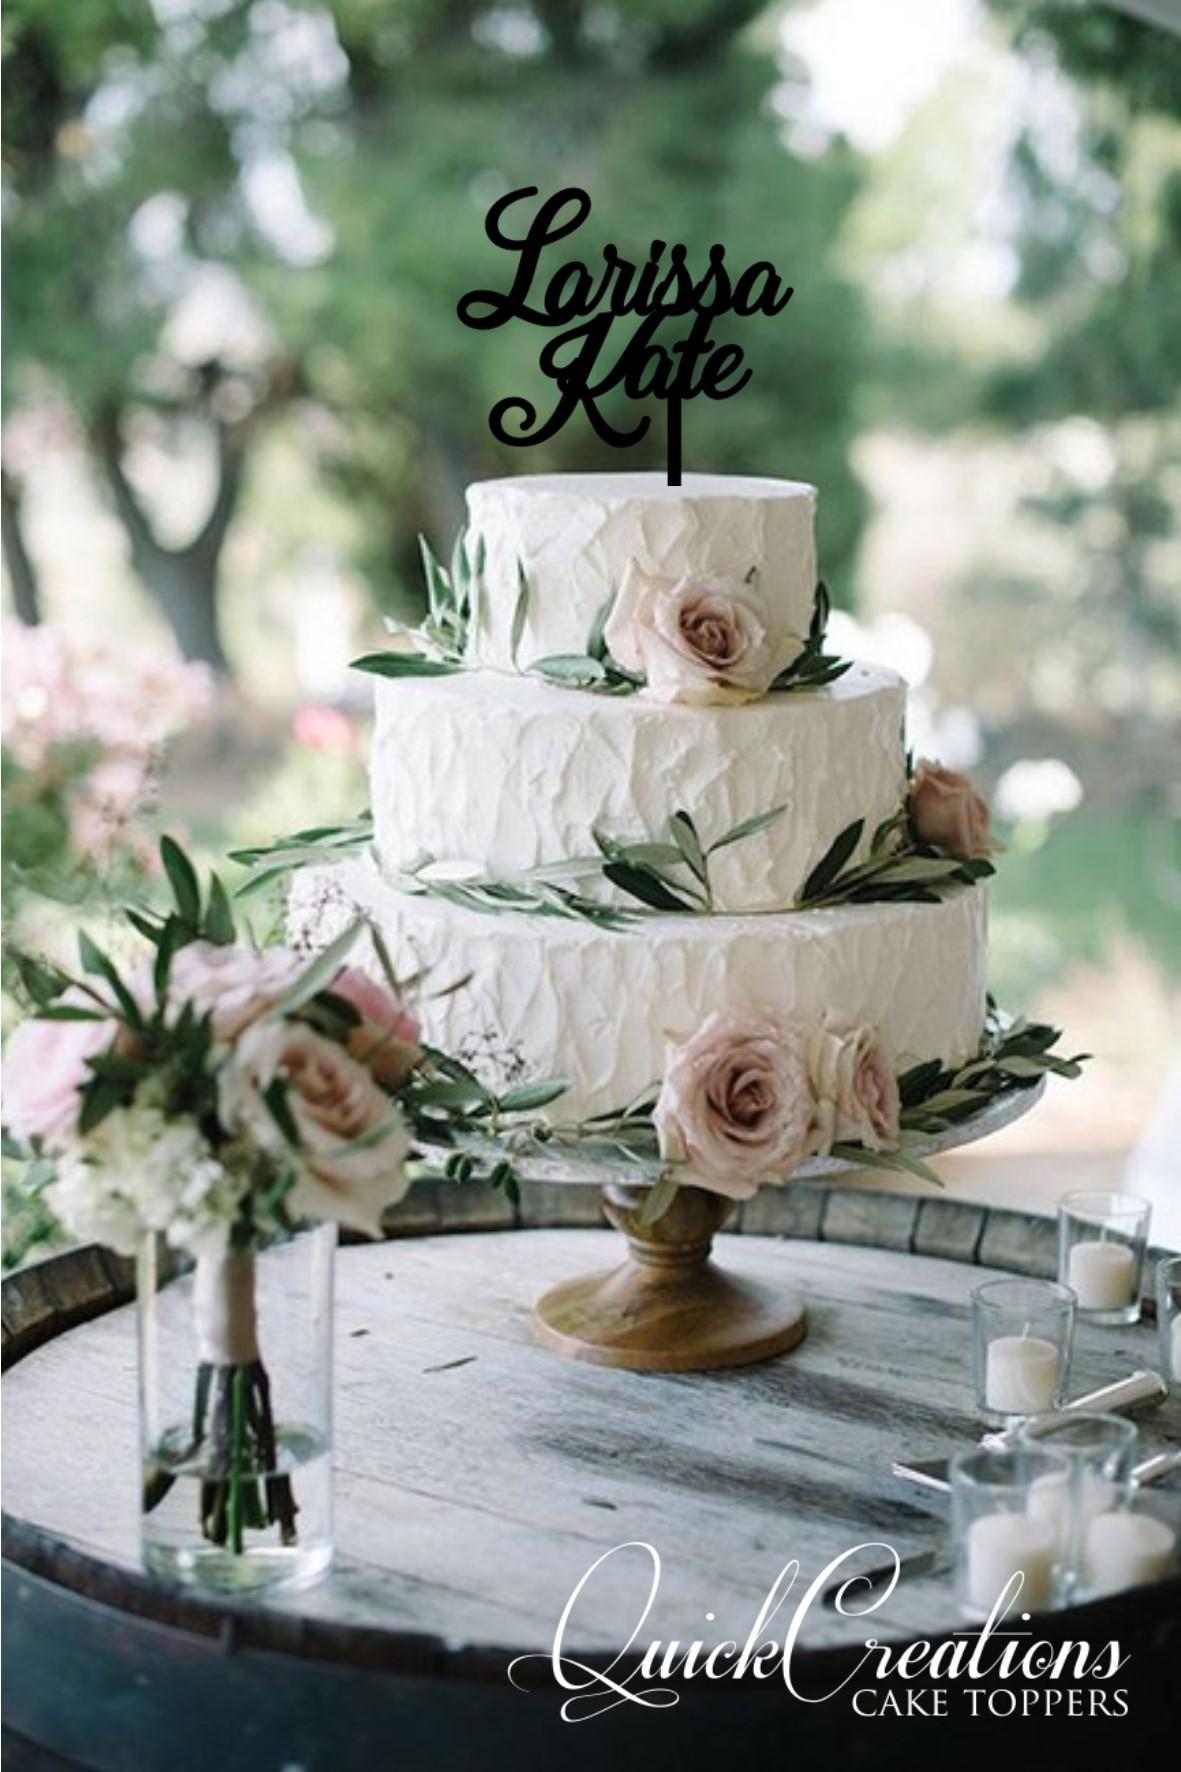 Quick Creations Cake Topper - Larissa Kate